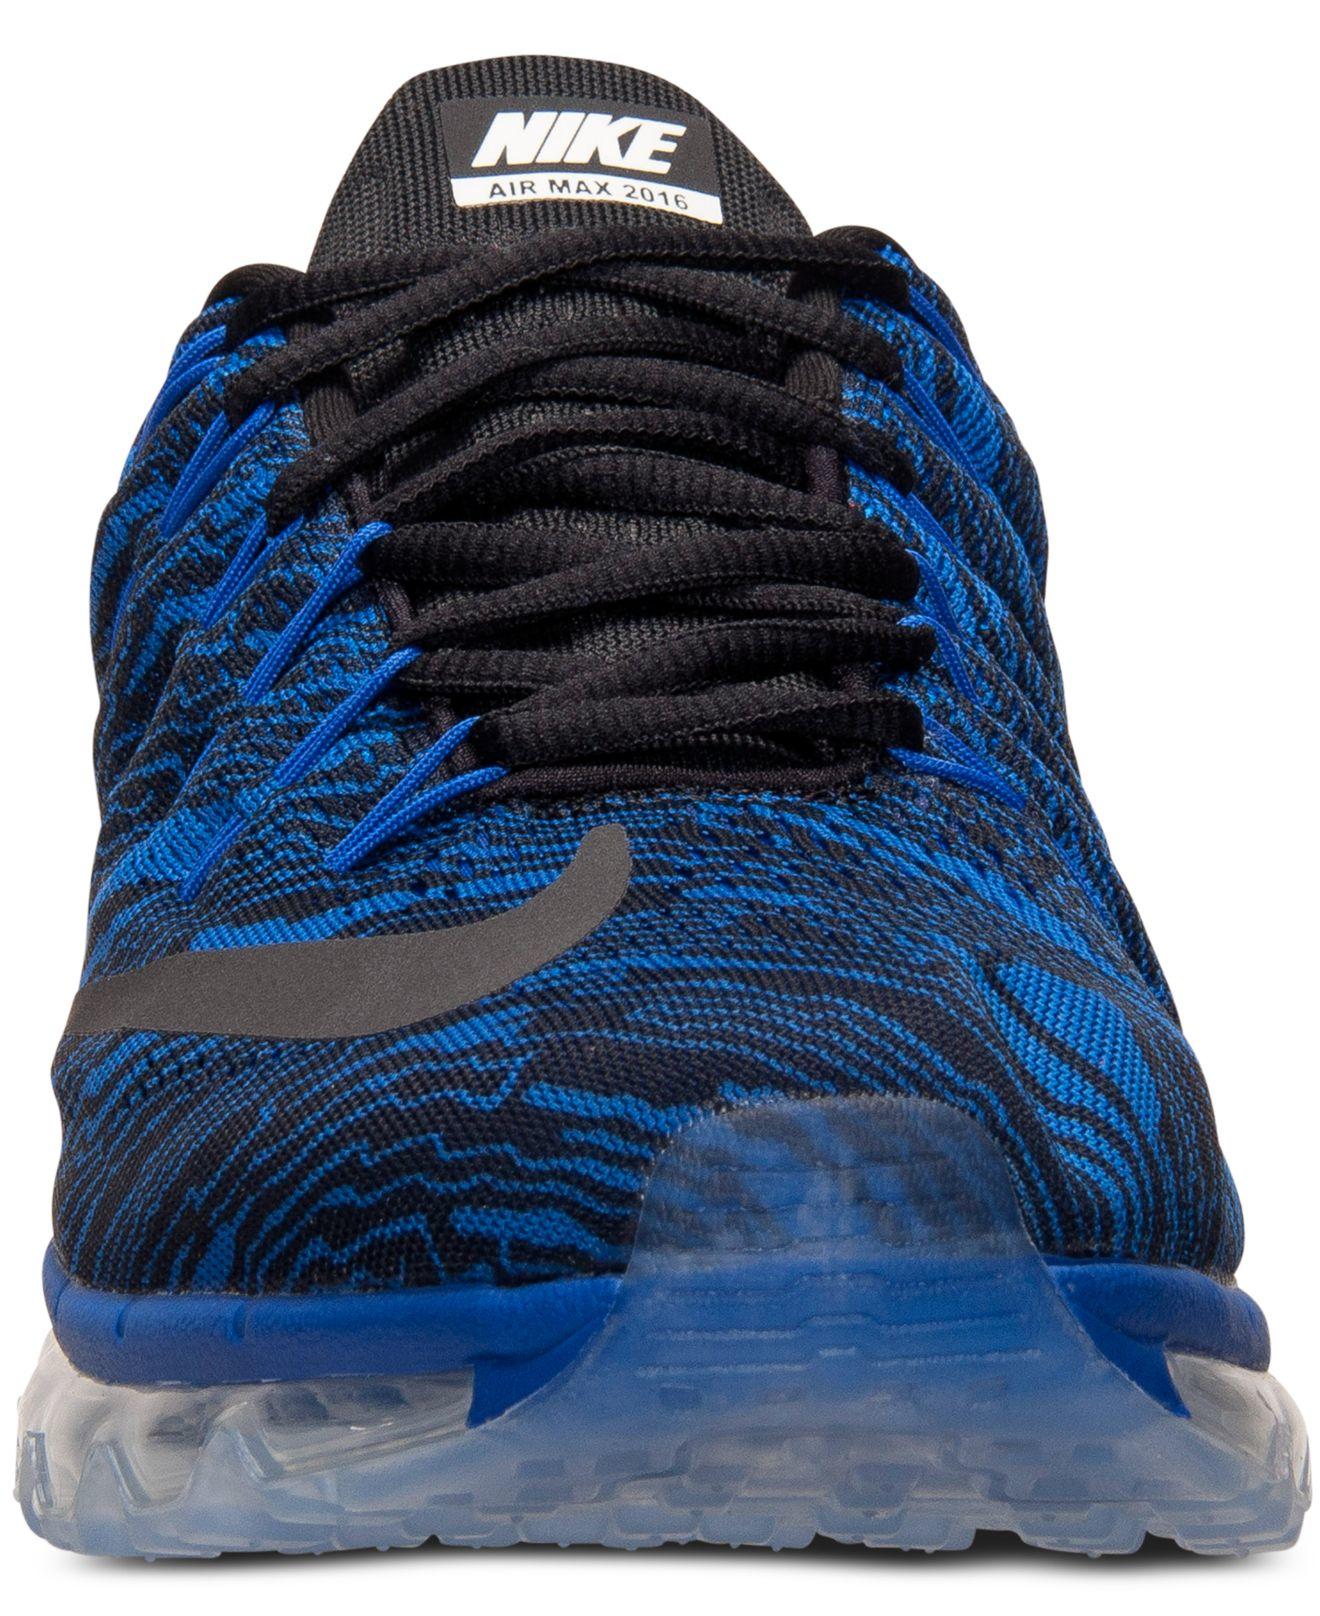 air max 2016 blauw zwart